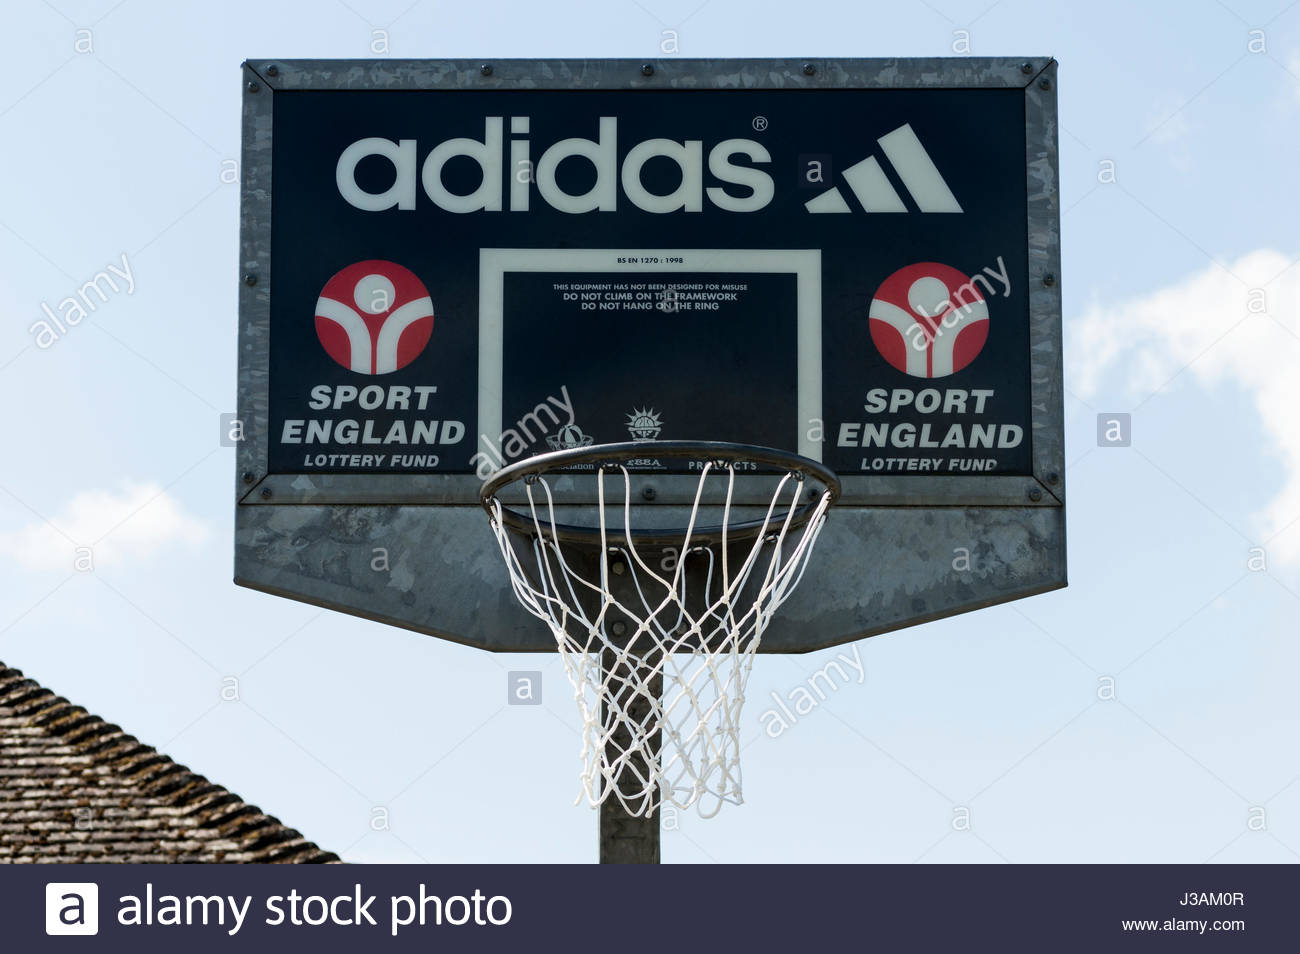 Venta de de aro de baloncesto Venta adidas, hasta adidas, 33% de descuento c81e7fc - accademiadellescienzedellumbria.xyz